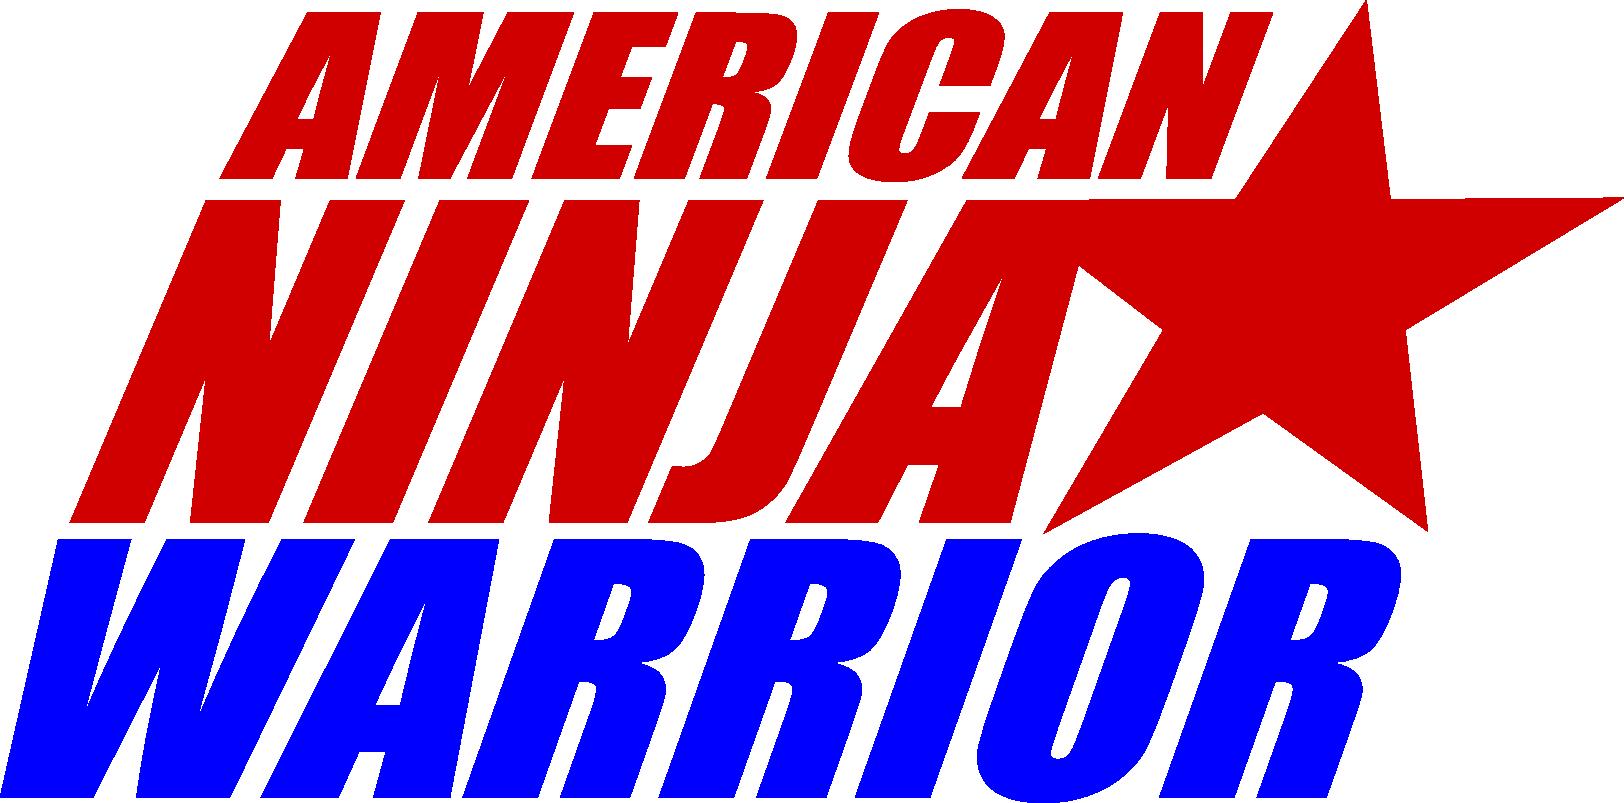 Newspaper clipart logo. Image american ninja warrior